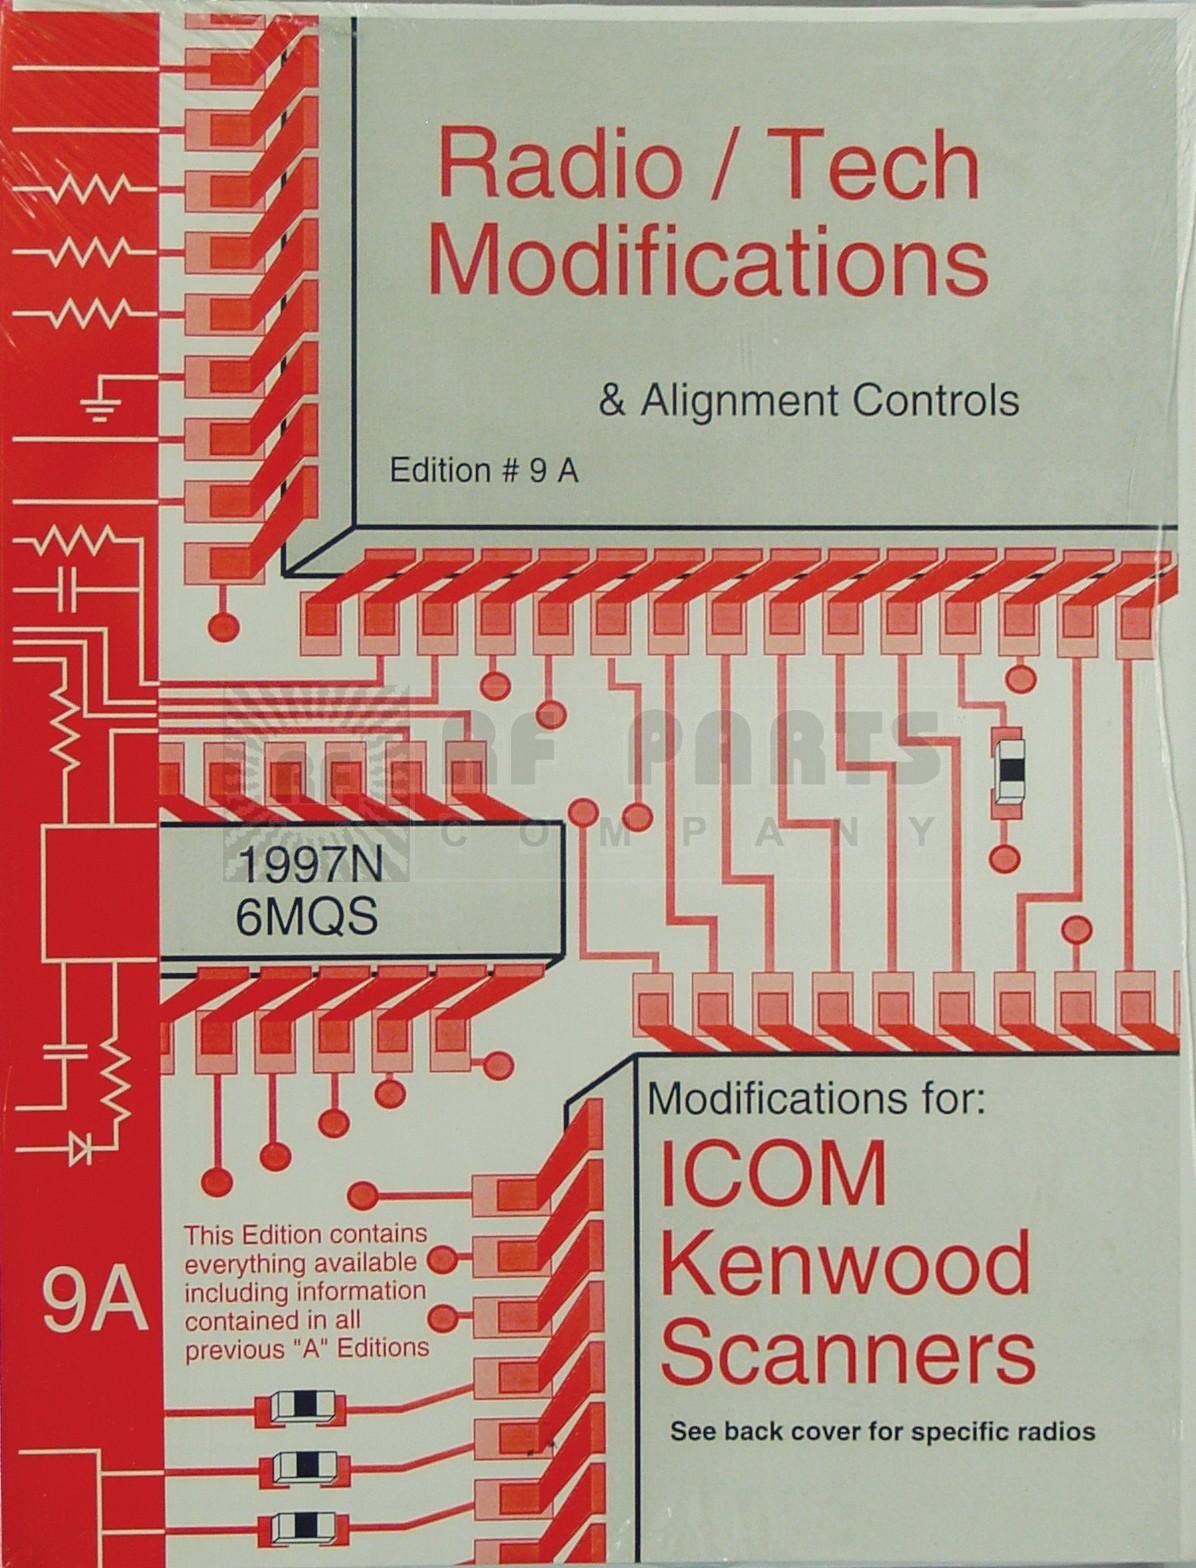 RTM9A Book, Radio Tech Mod